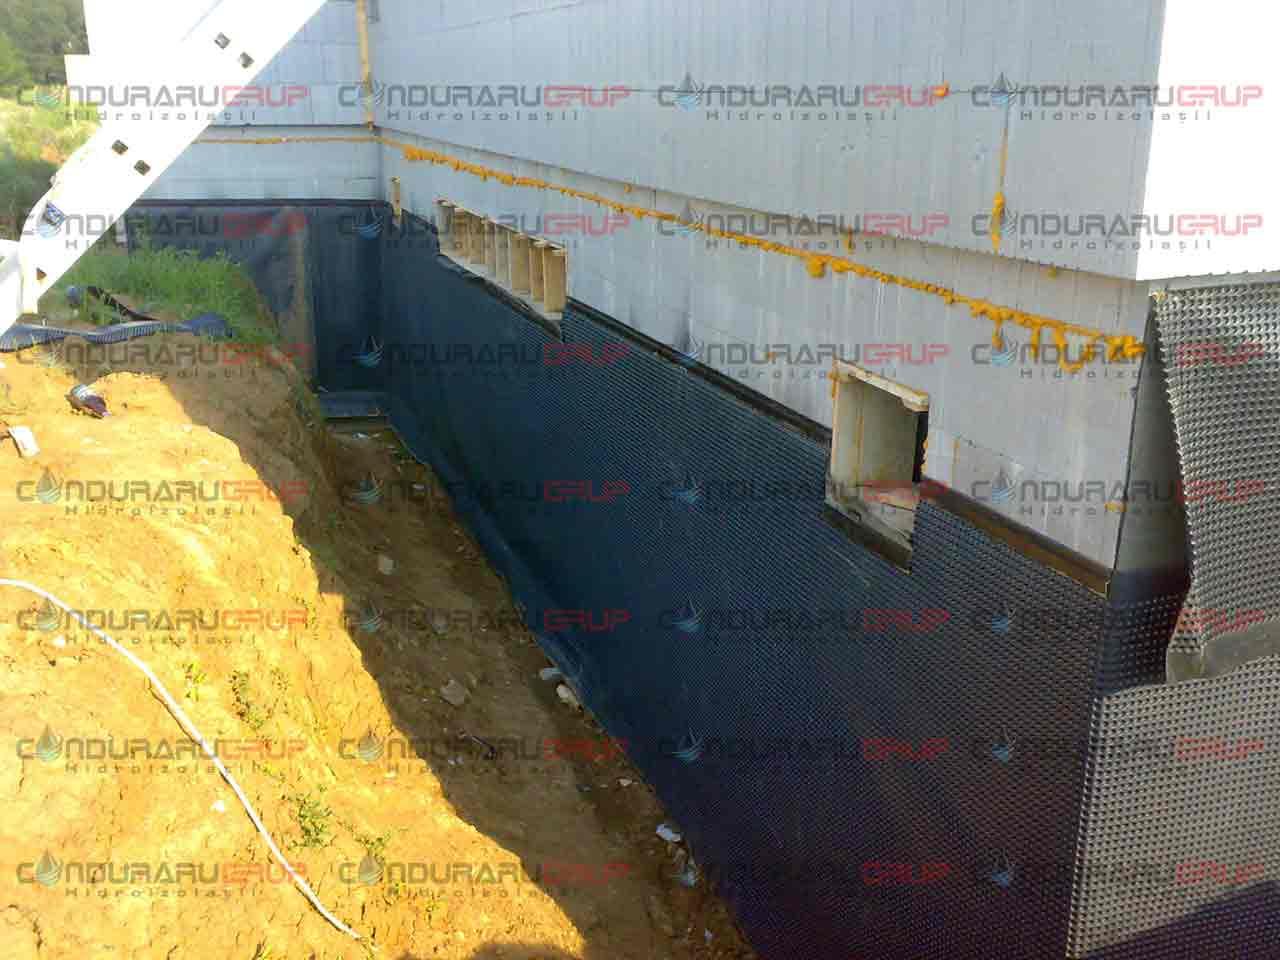 Constructie sistem Amvic CONDURARU GRUP - Poza 13